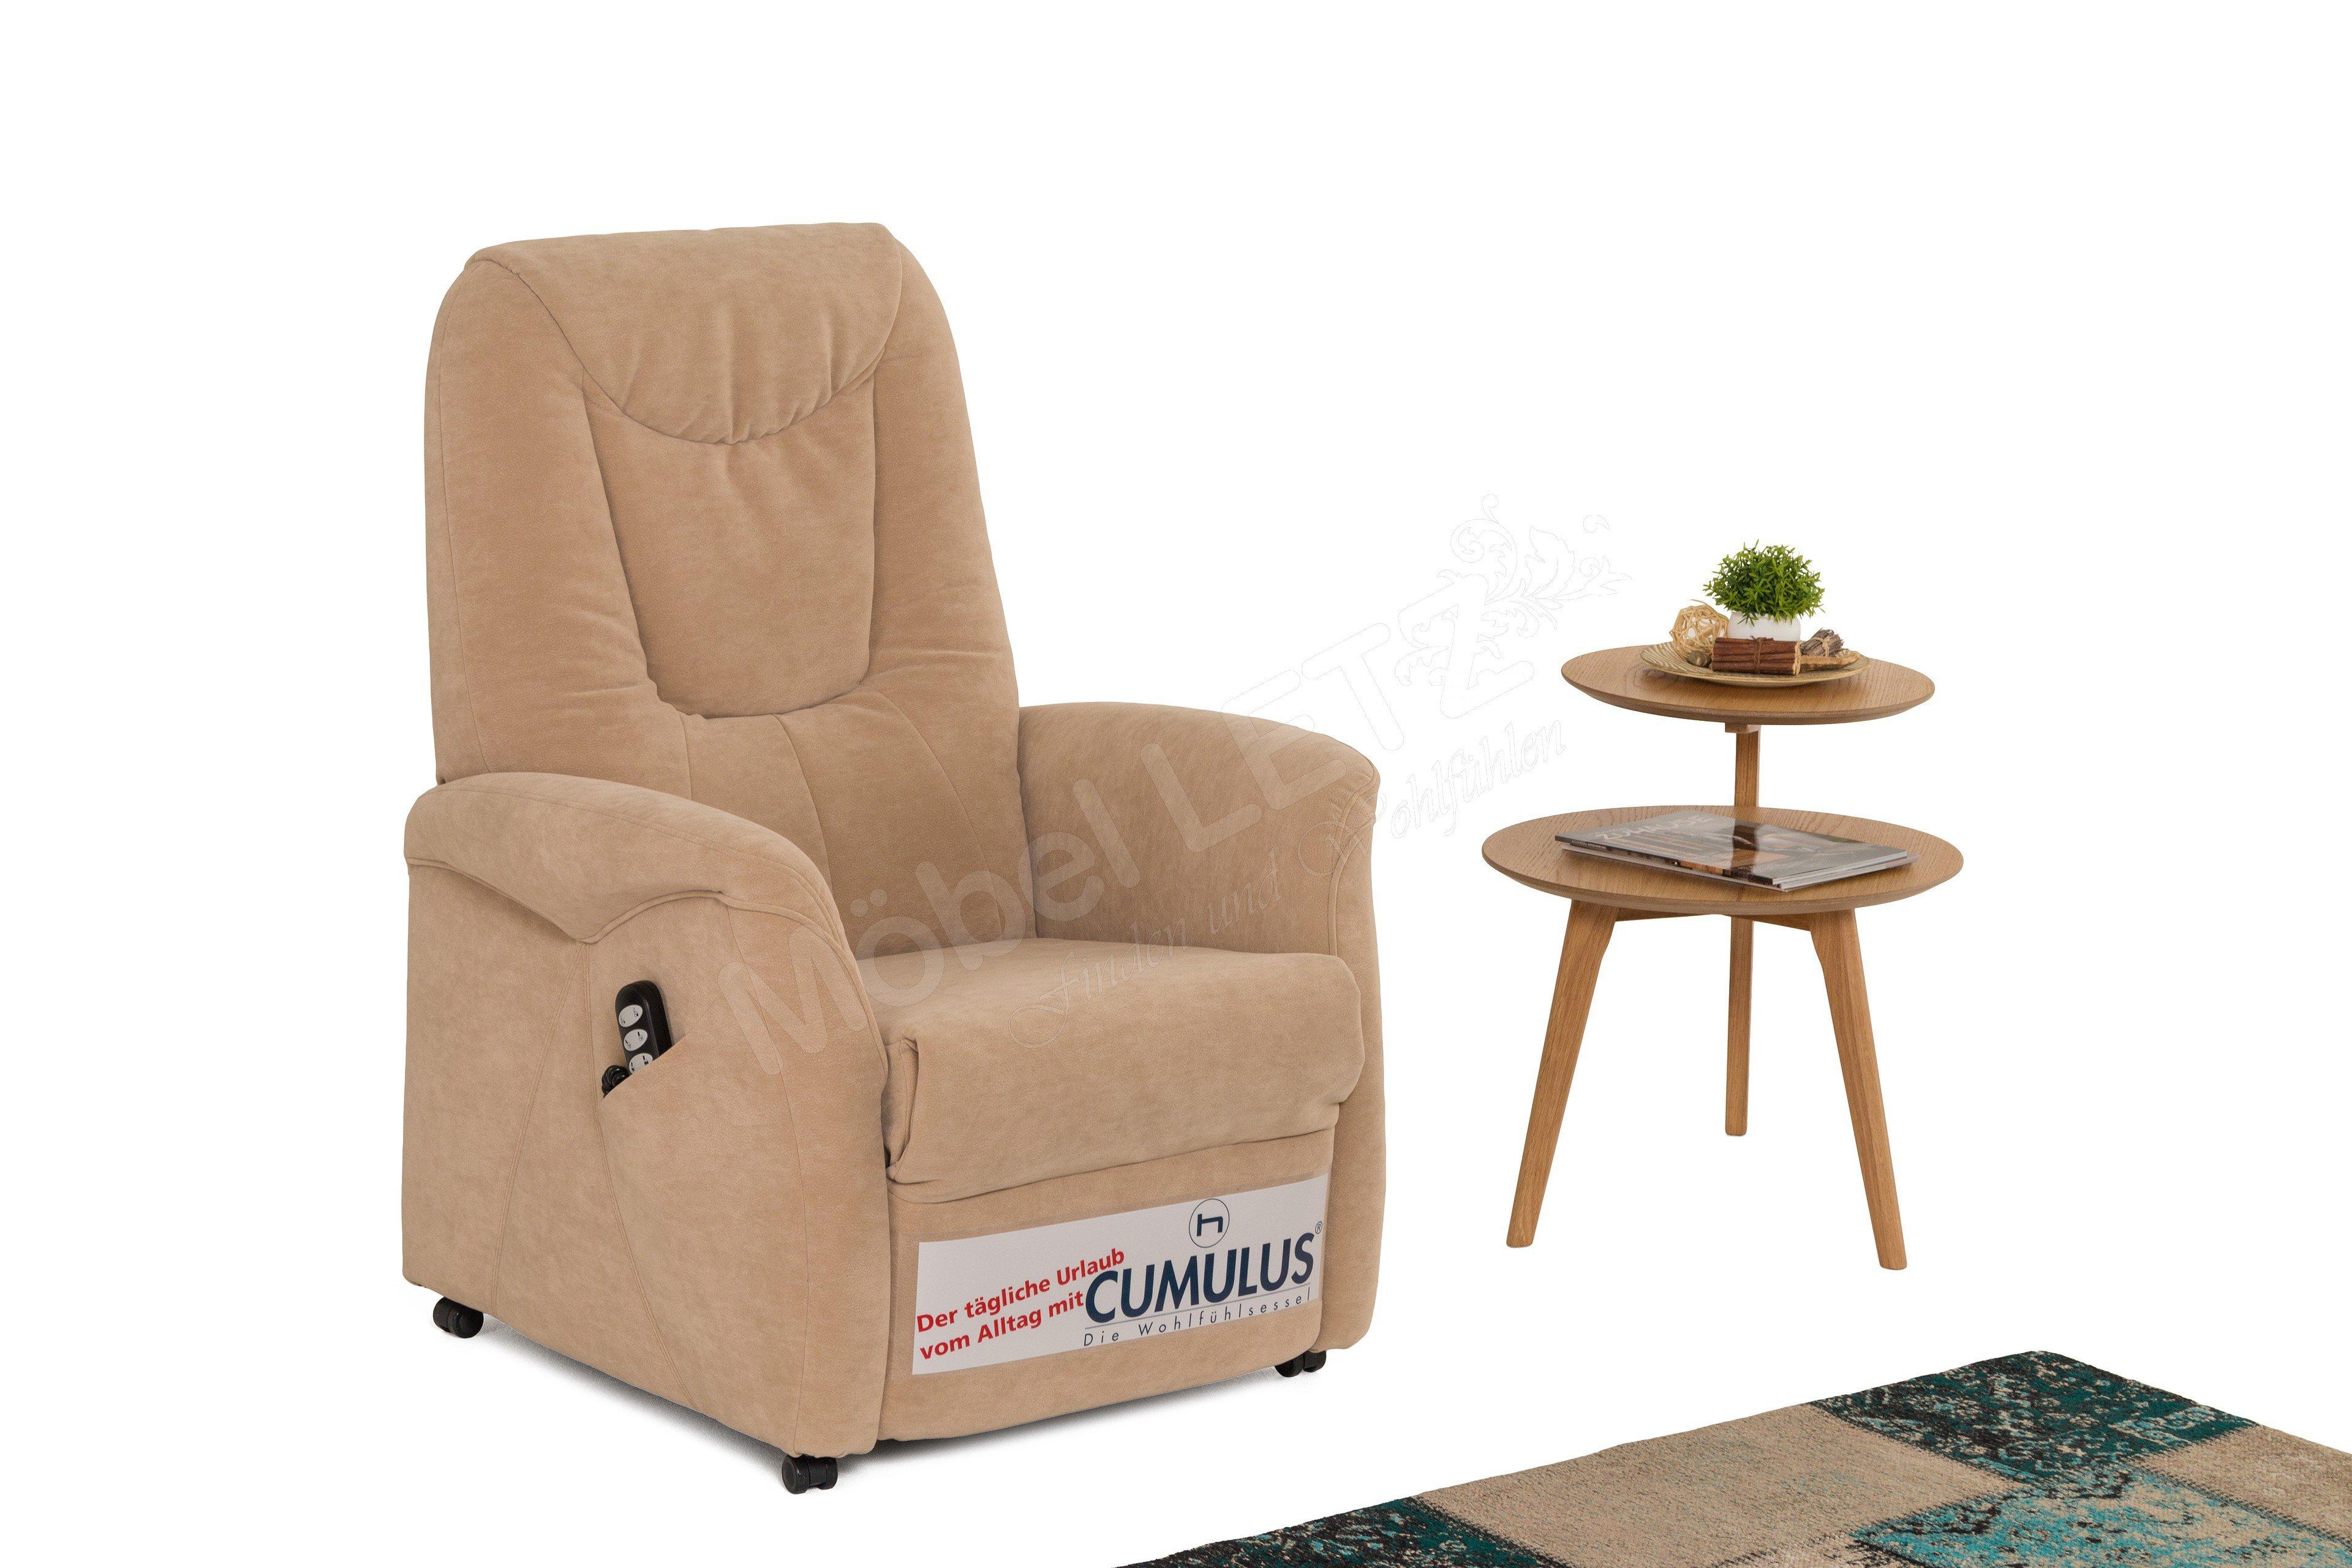 Himolla 9771 Relaxsessel In Creme Möbel Letz Ihr Online Shop